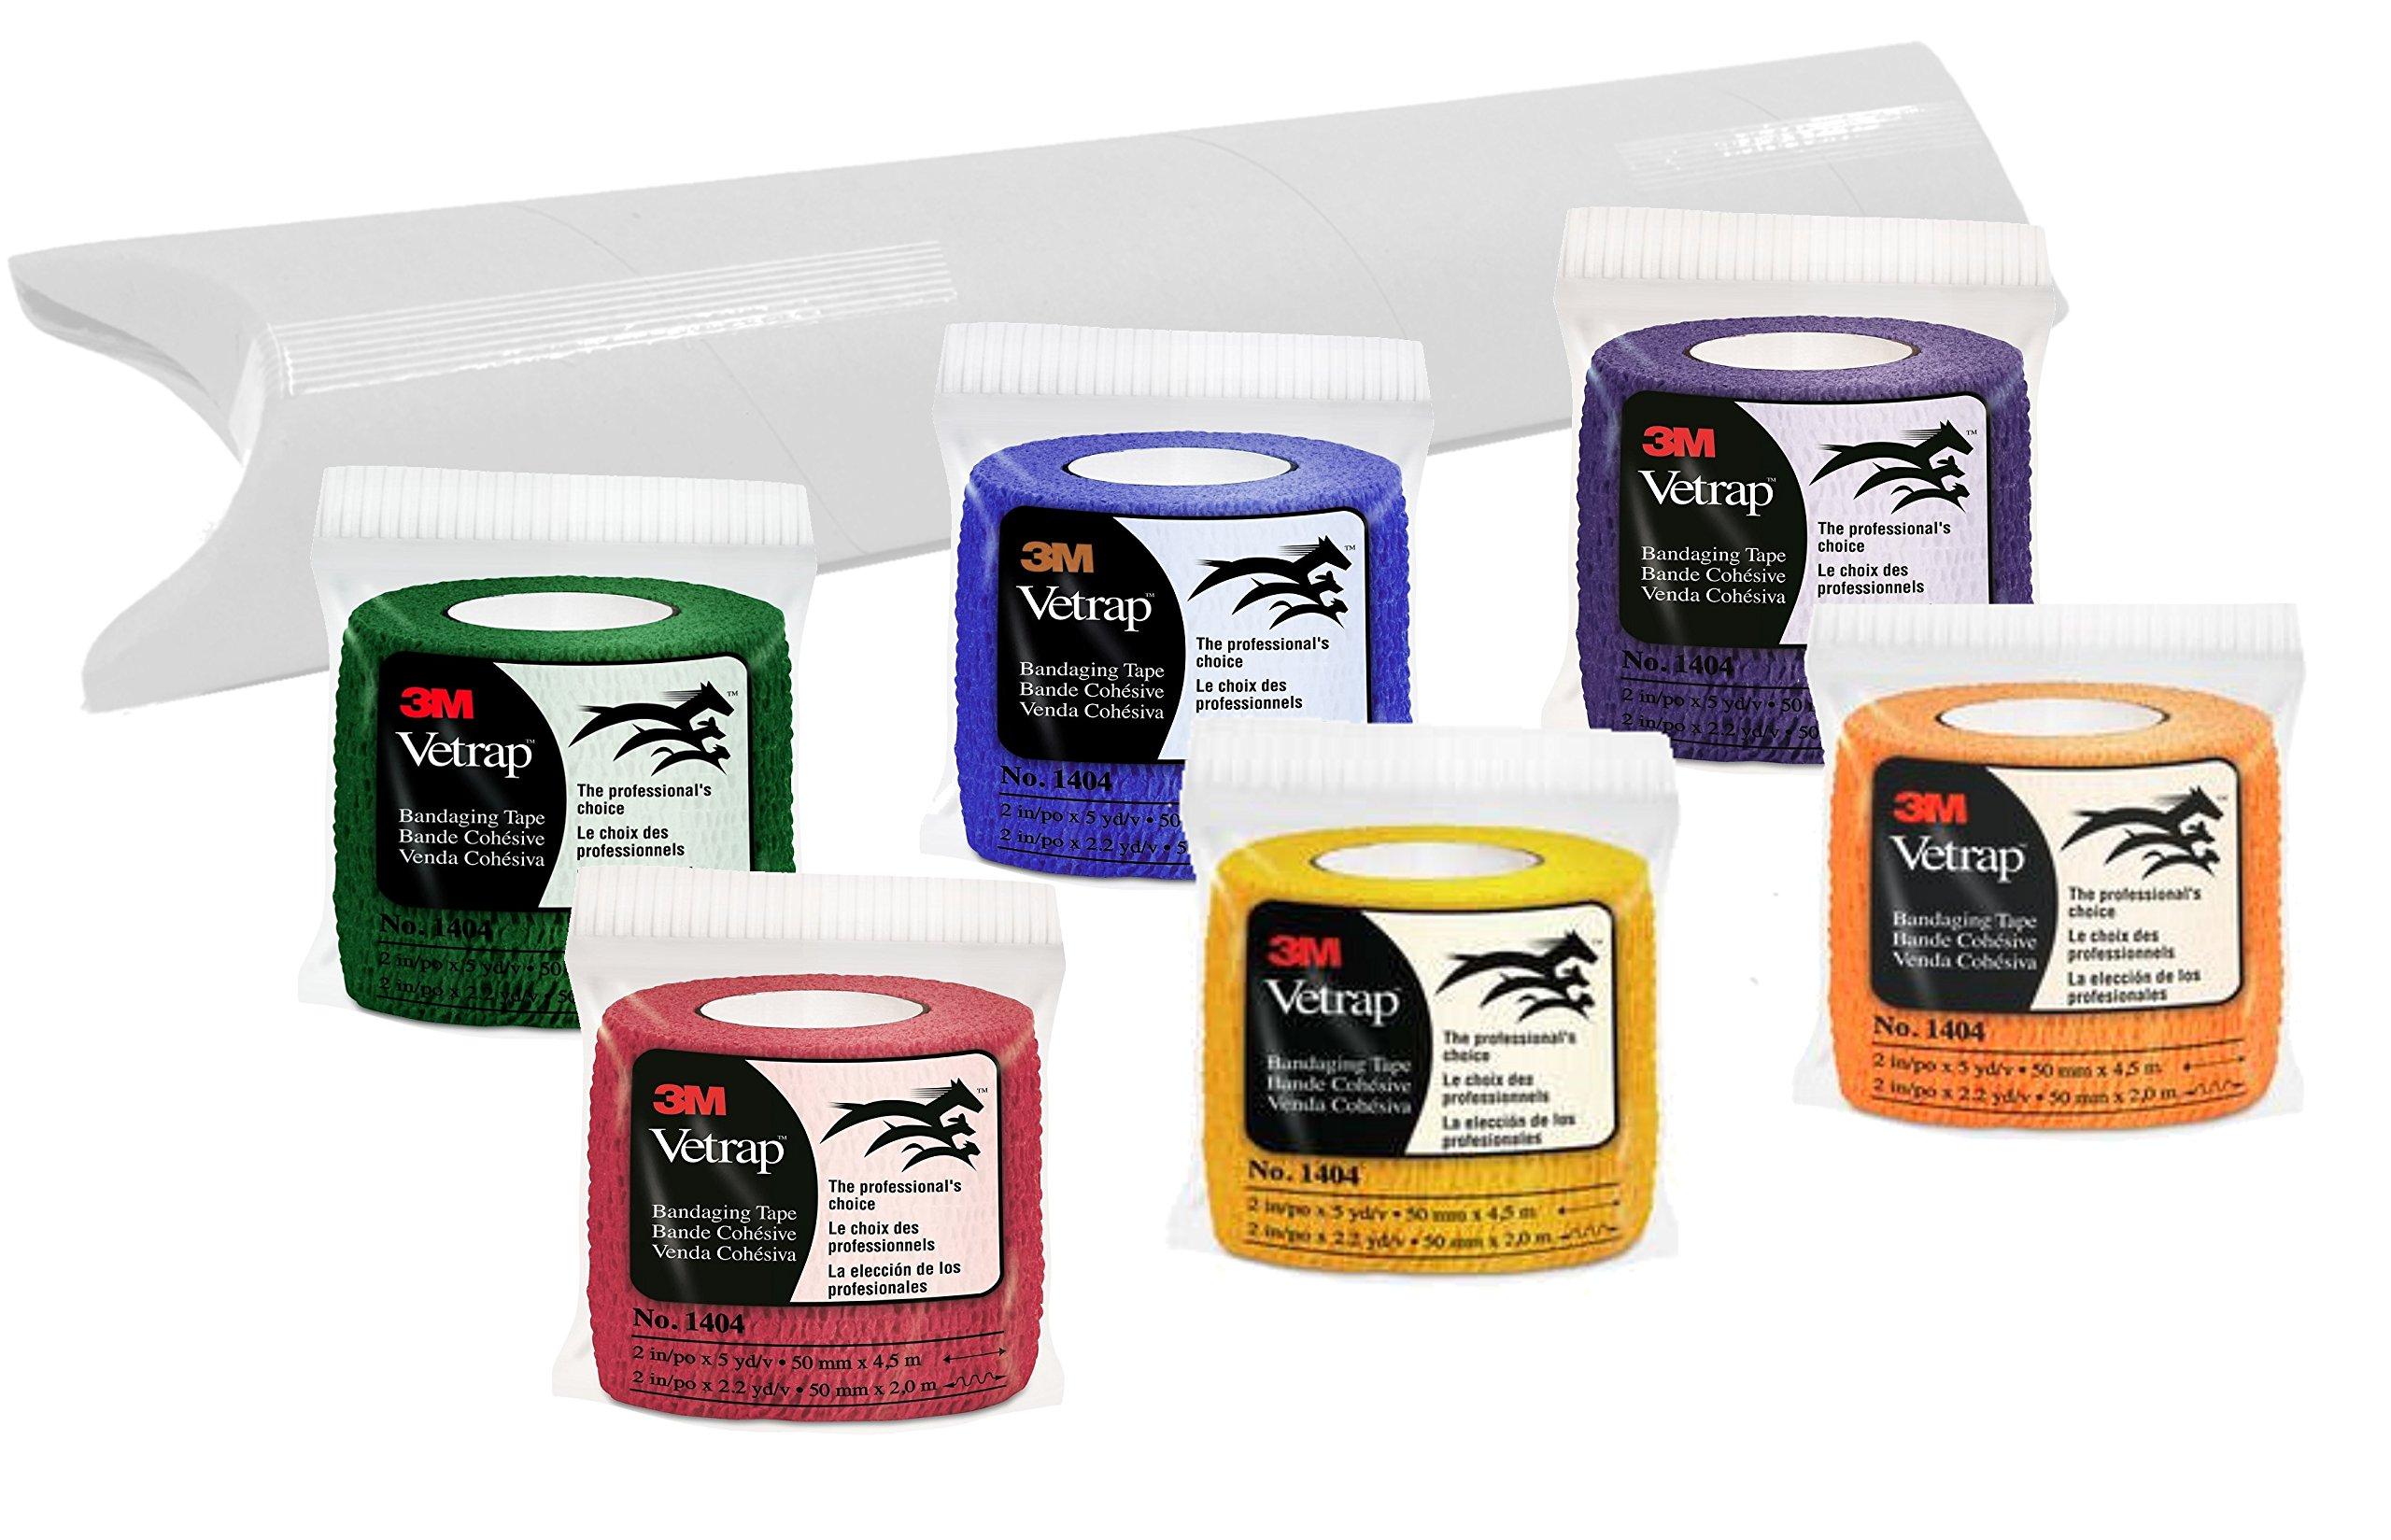 3M Vetrap 2'' Bandaging Tape, 2''x 5 Yards, (6 Rolls, Rainbow Combo) by 3M Vetrap